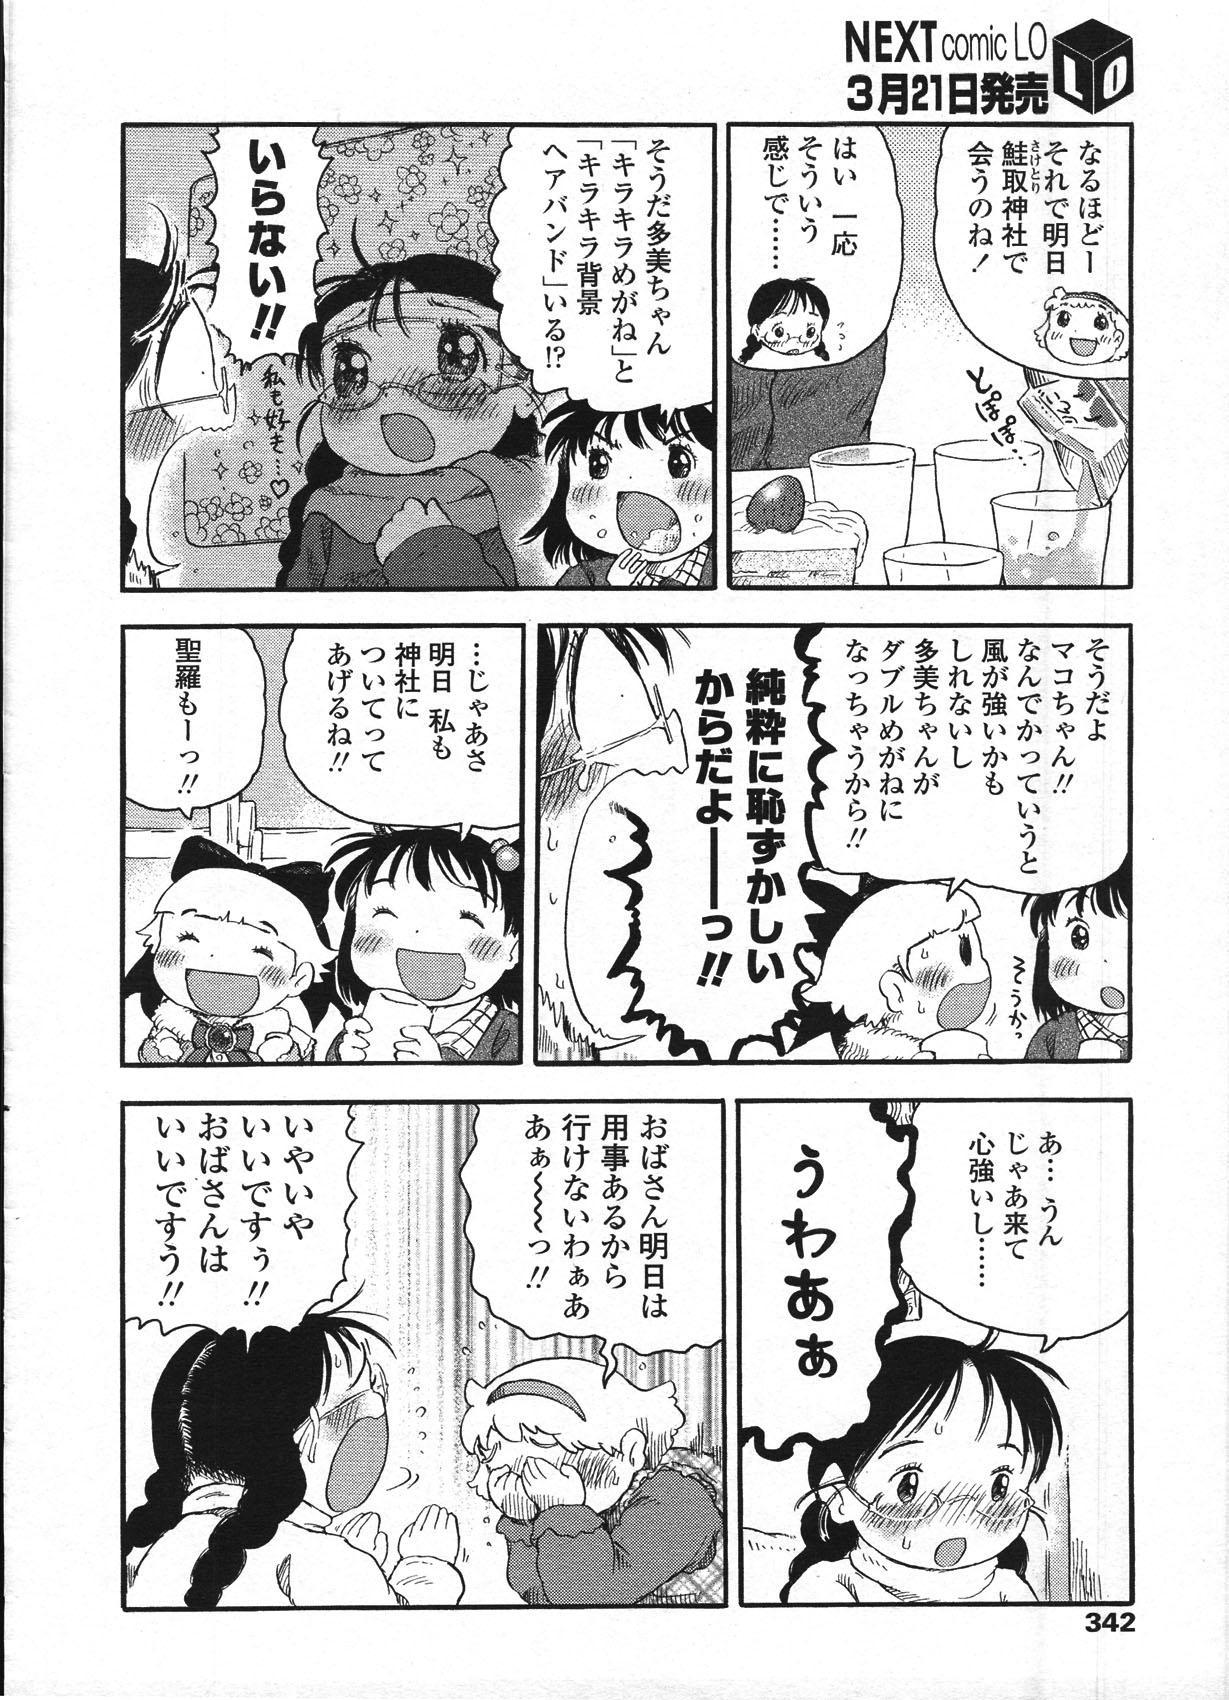 Comic LO 2009-04 Vol. 61 344